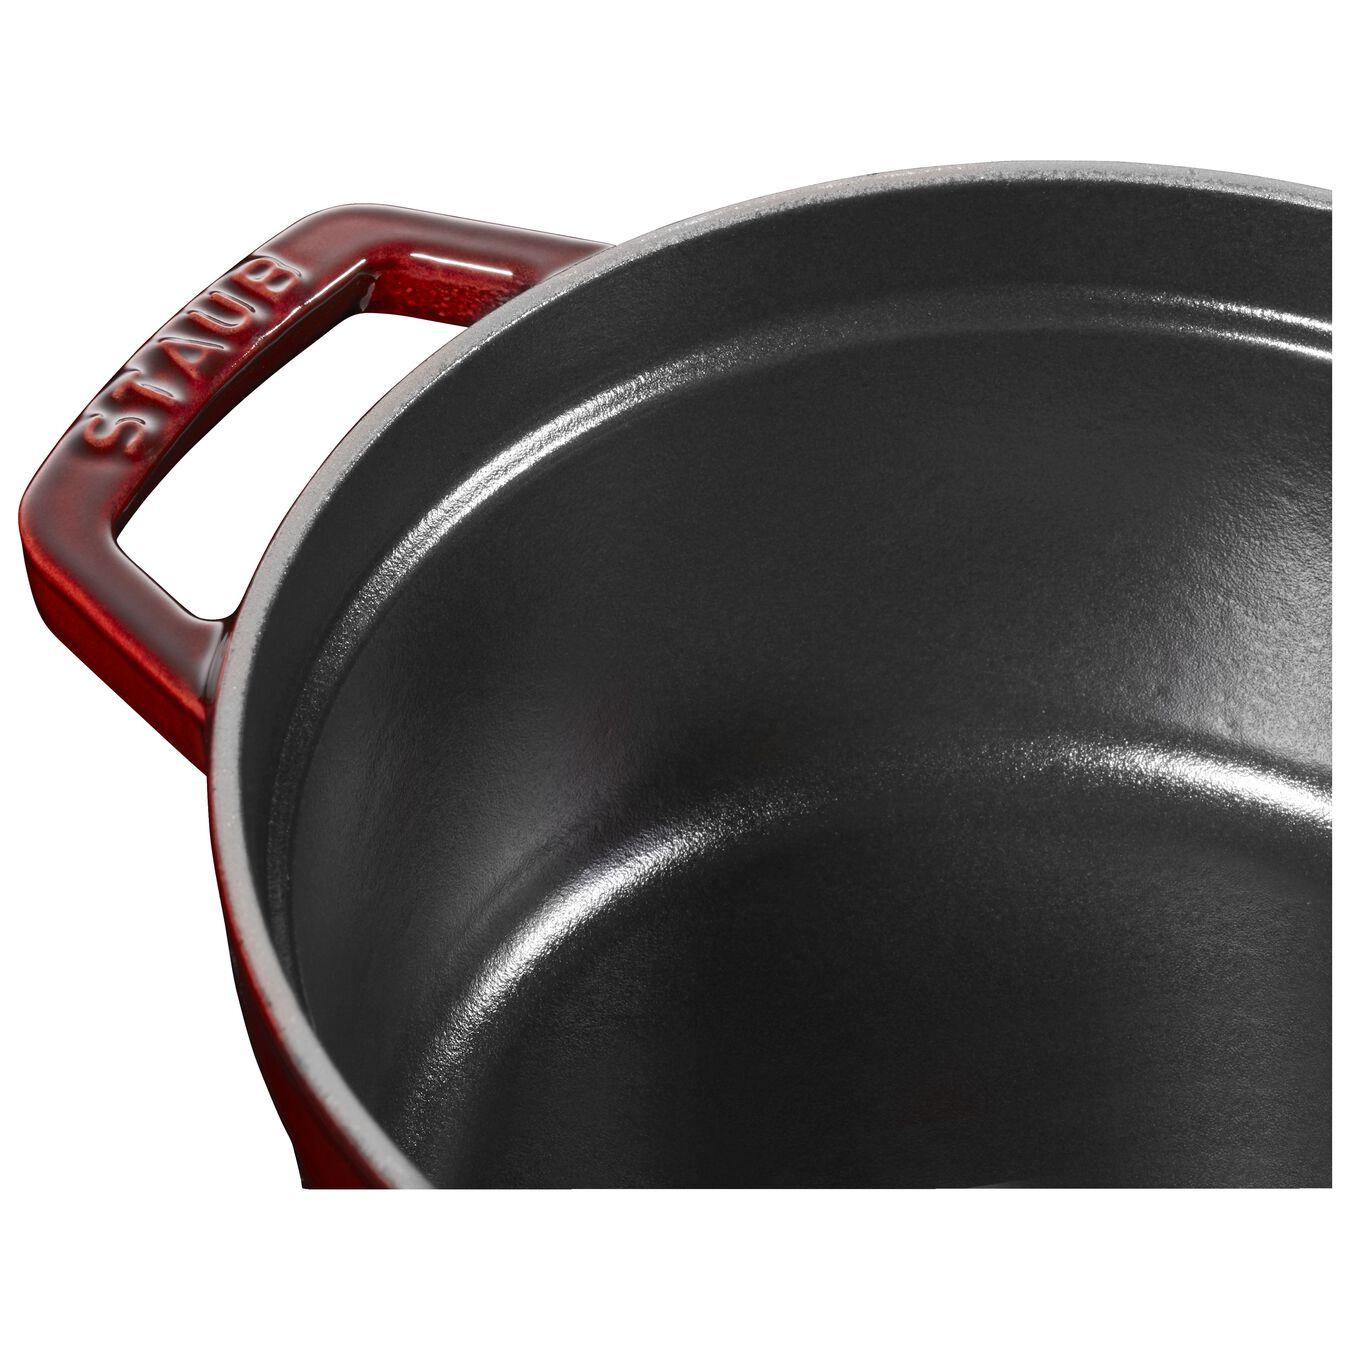 2.25 l Cast iron round Saute pan, Grenadine-Red,,large 4